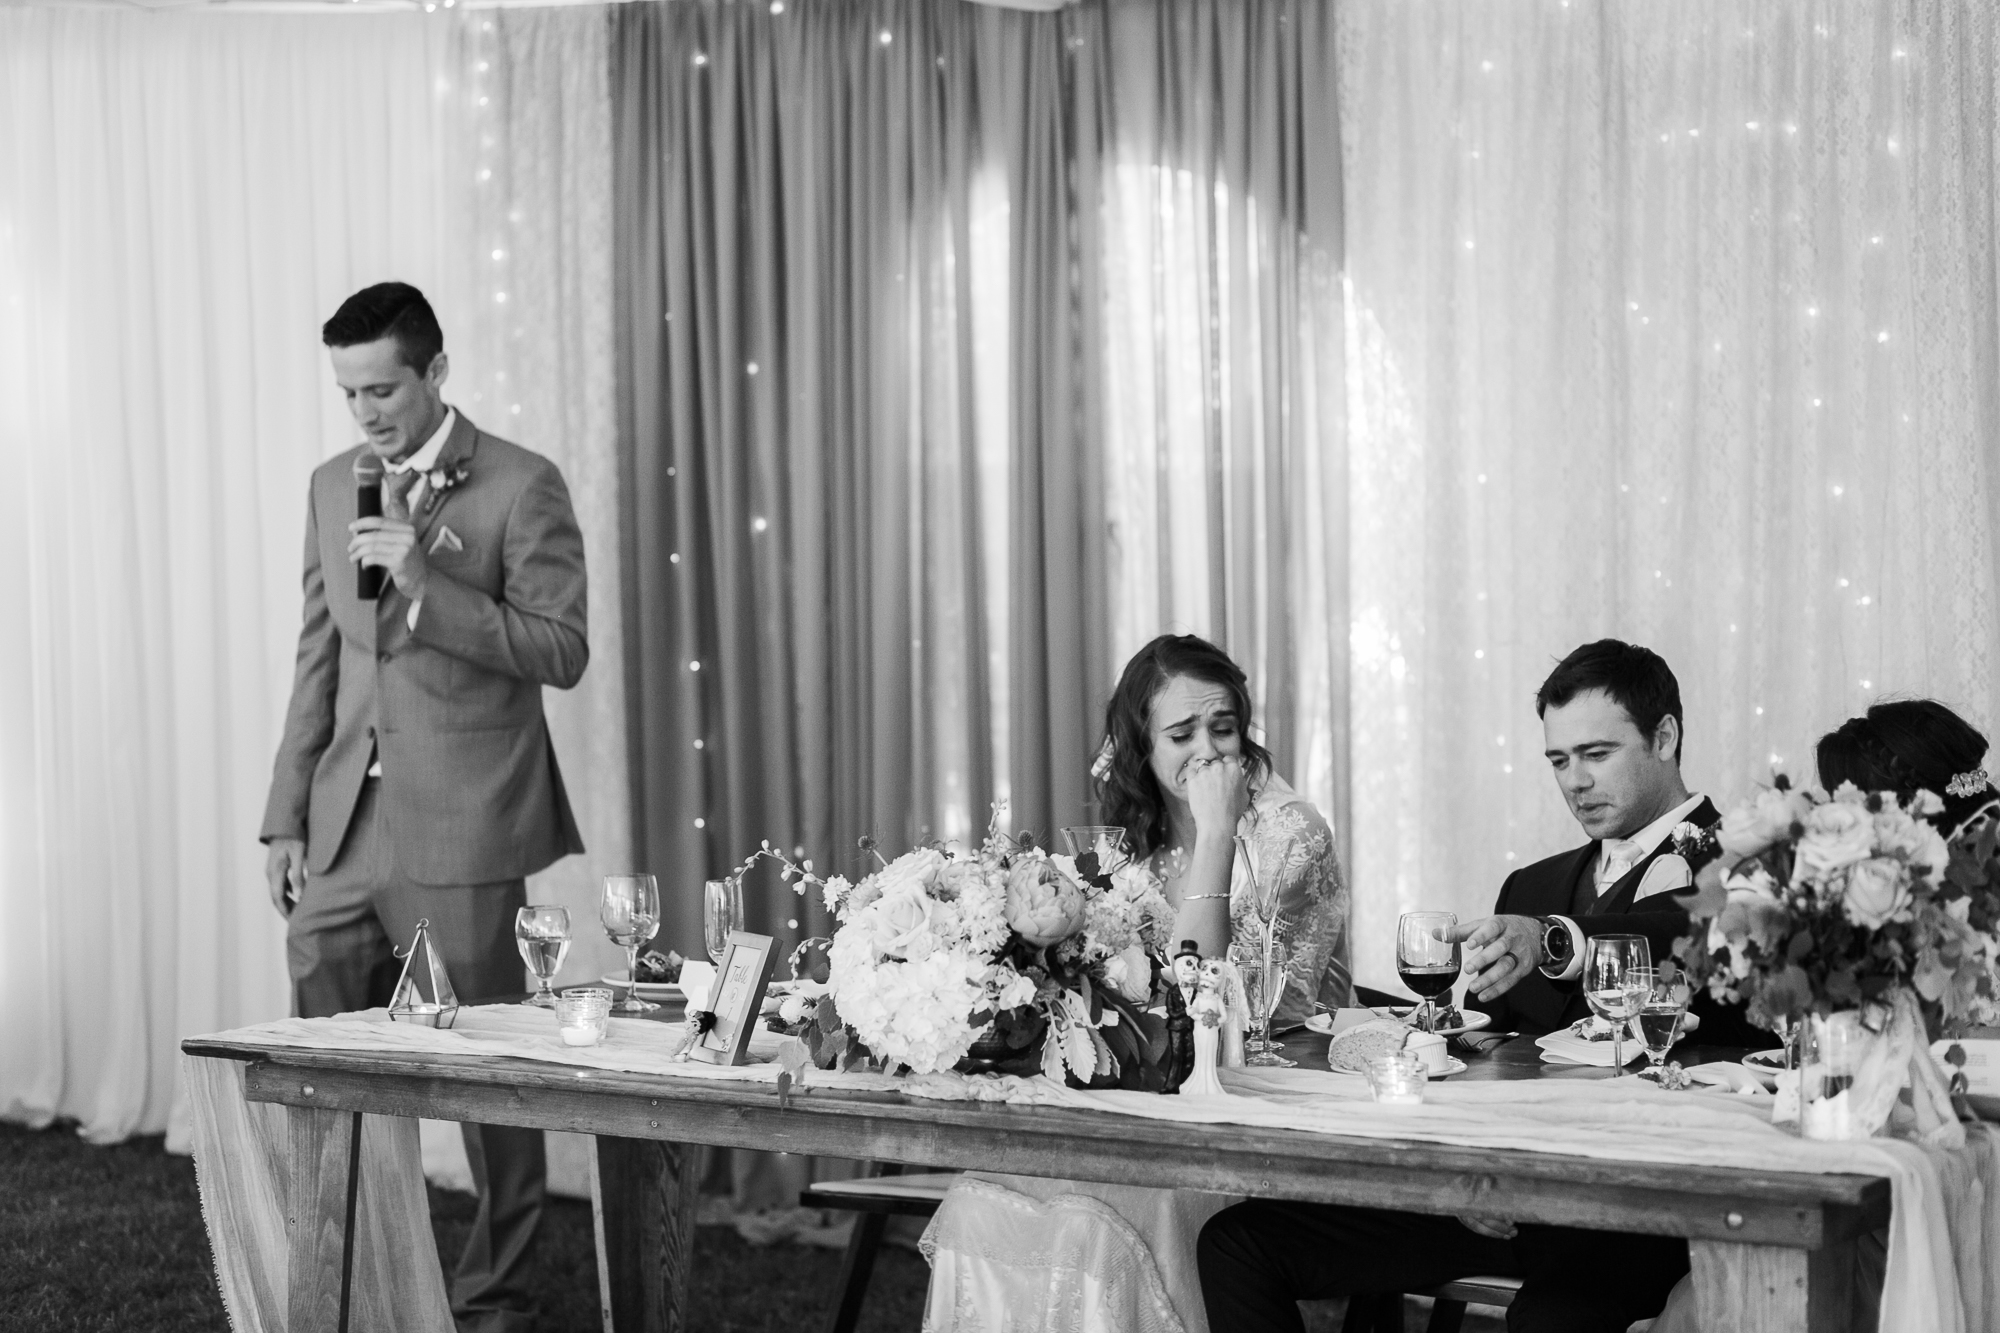 maccallum house wedding, maccallum house mendocino, mendocino wedding, mendocino wedding photographer, maria villano photography, maccallum house, cypress grove mendocino, cypress grove mendocino, cypress grove wedding